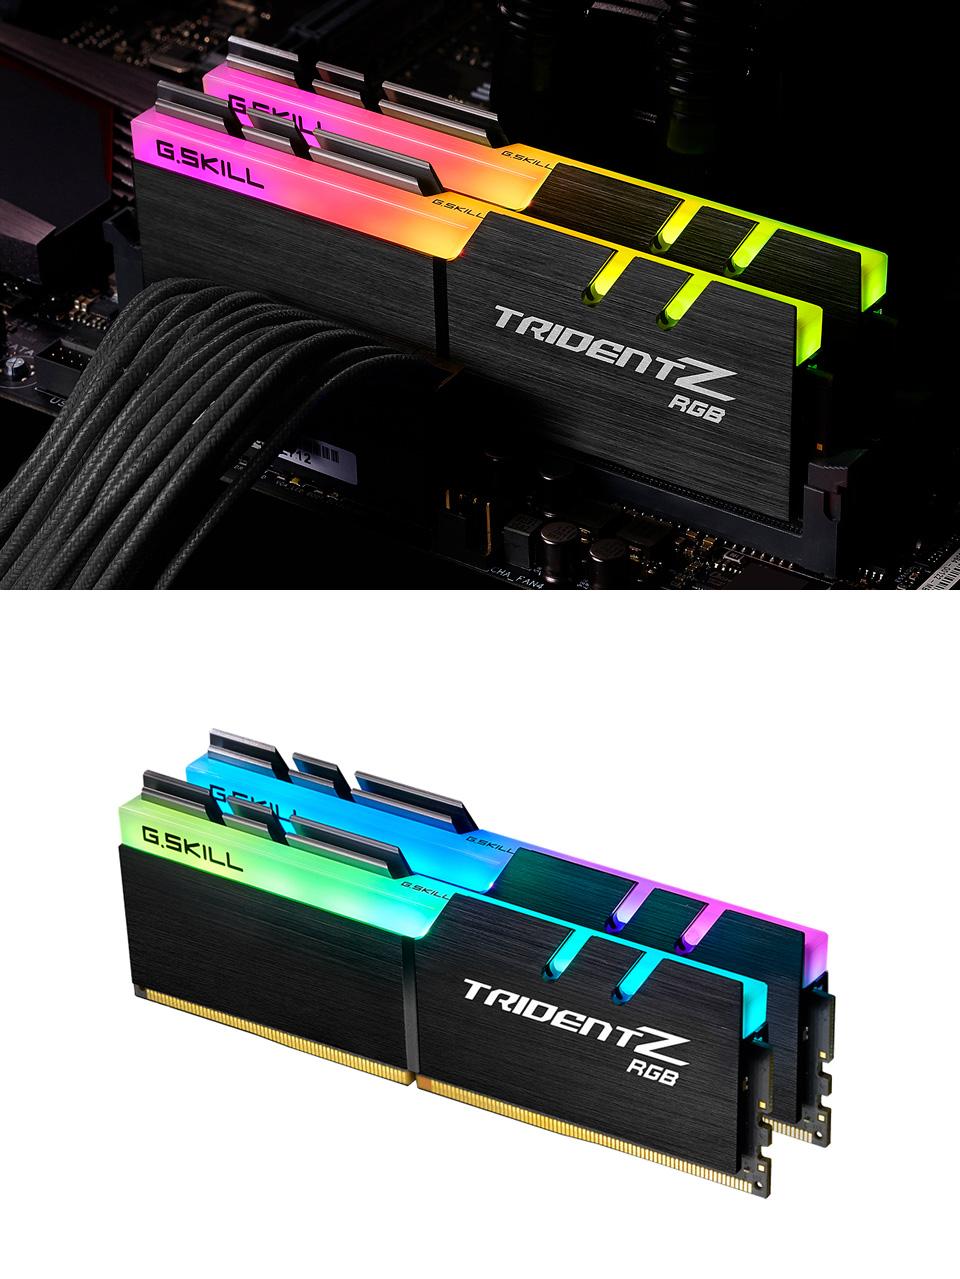 G.Skill Trident Z RGB F4-3600C16D-32GTZR 32GB (2x16GB) DDR4 product